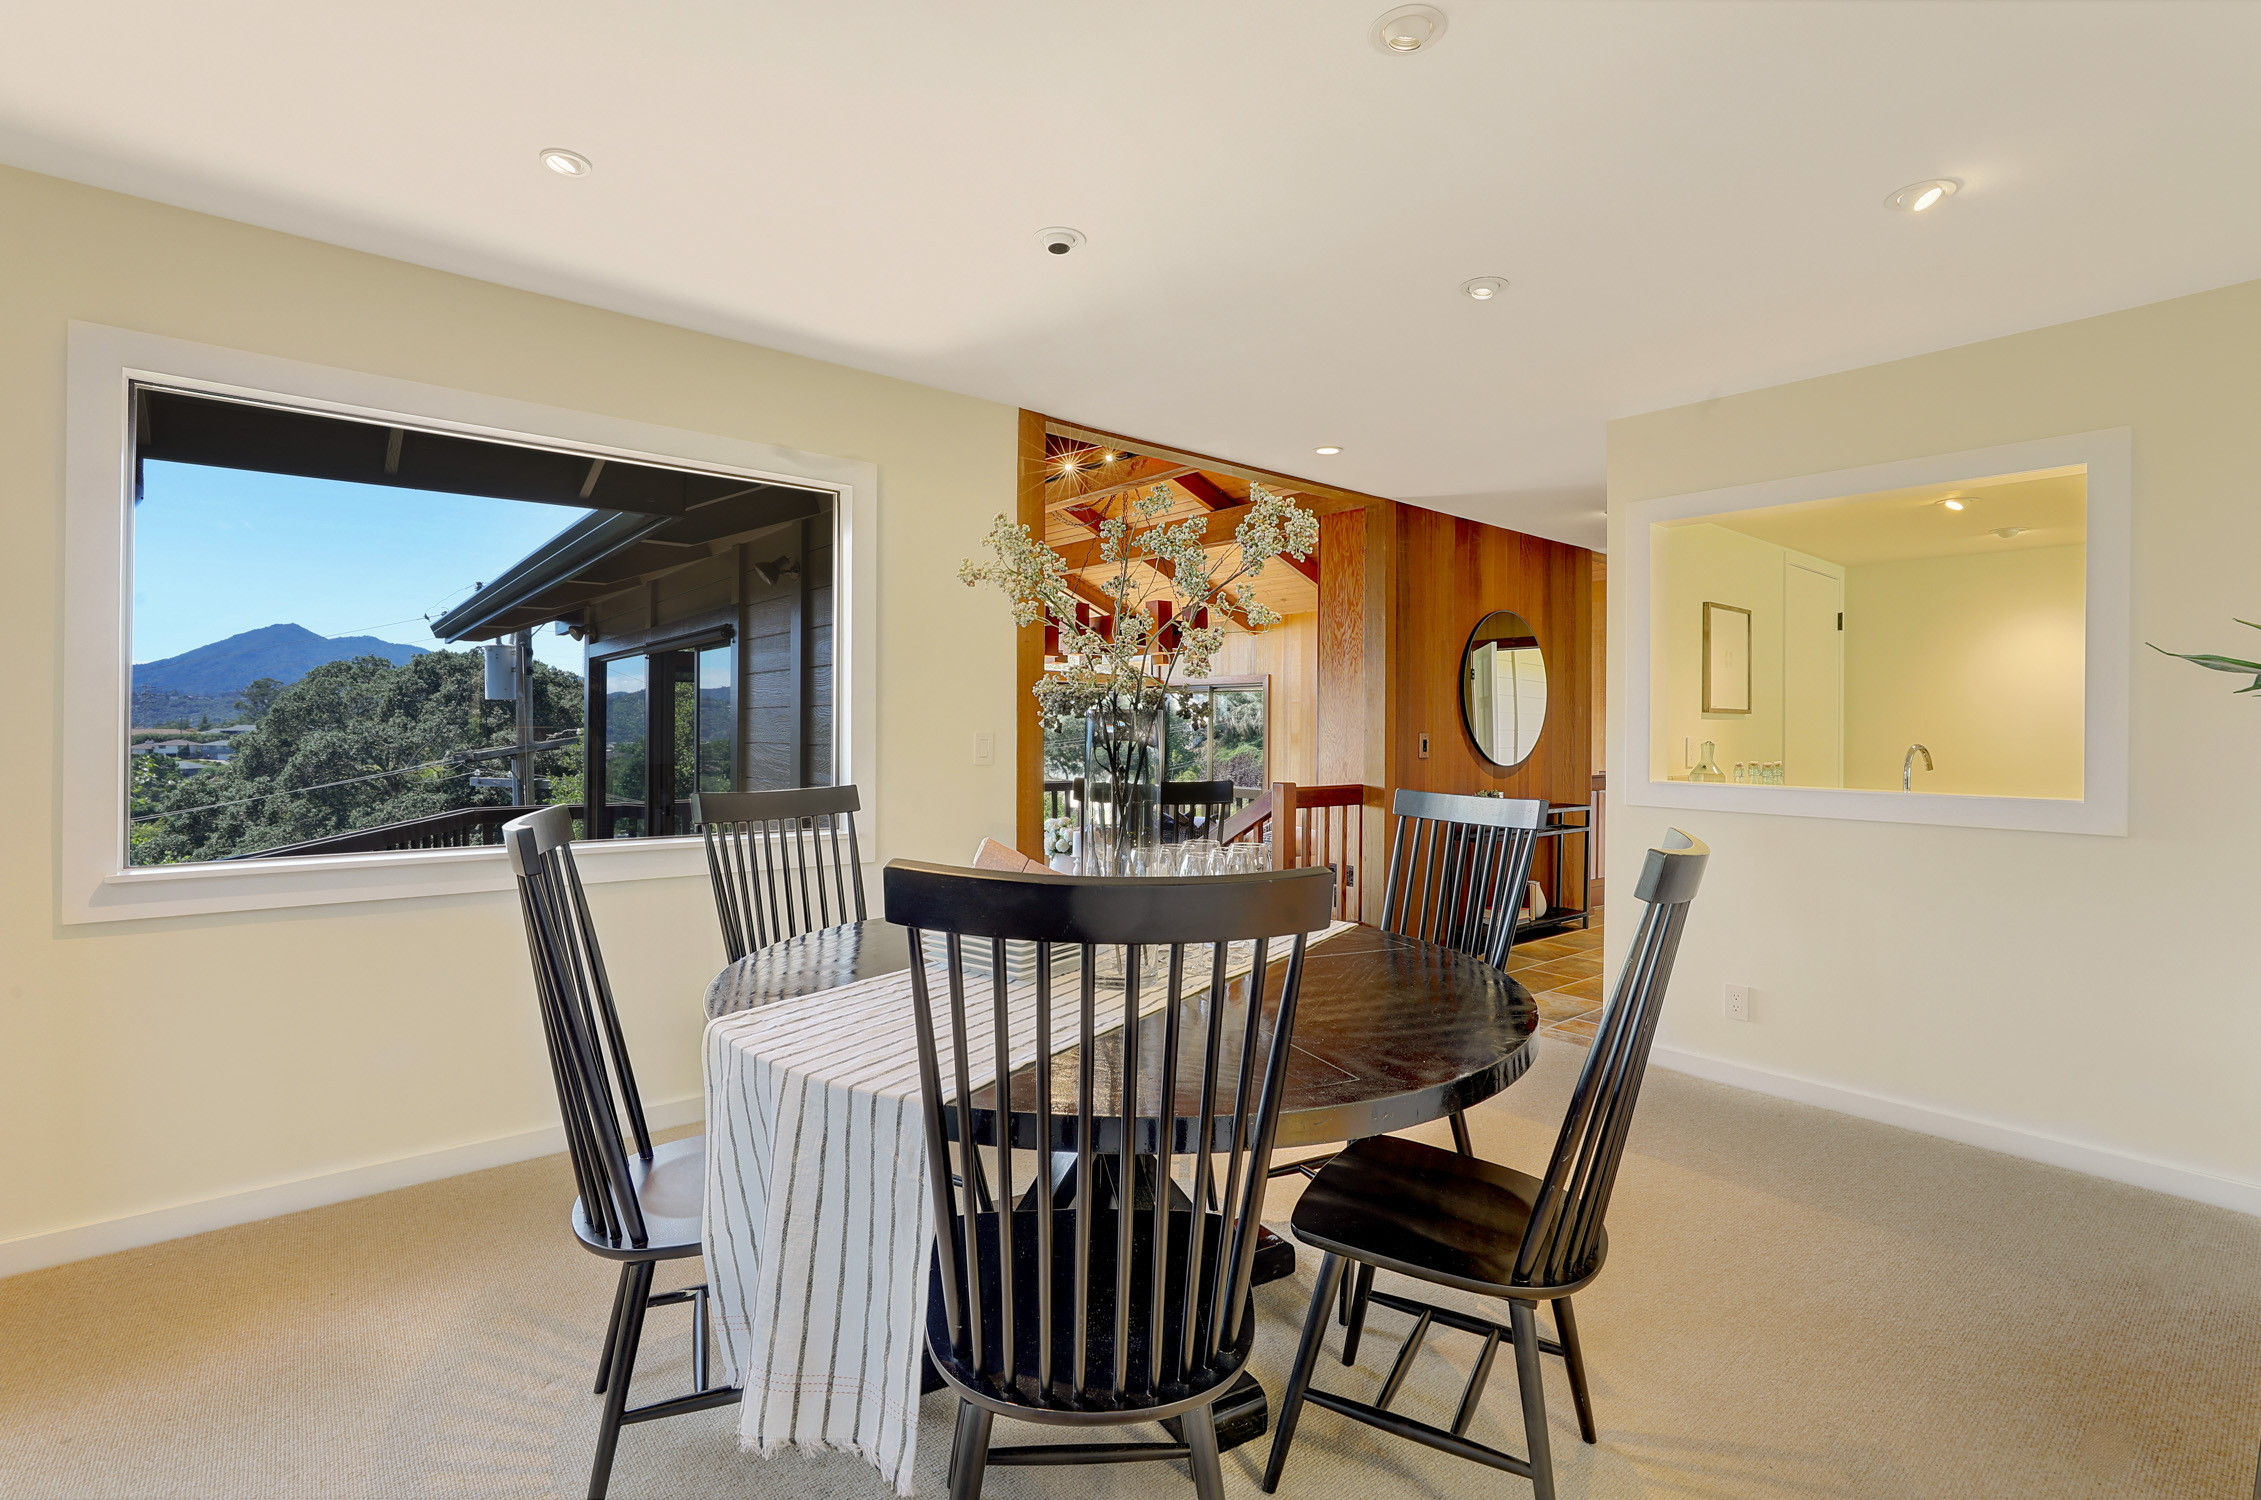 16Dorian 28 MLSSan Rafael Real Estate - Listed by Julia Fitzpatrick + Allie Fornesi Team Own Marin County .jpg